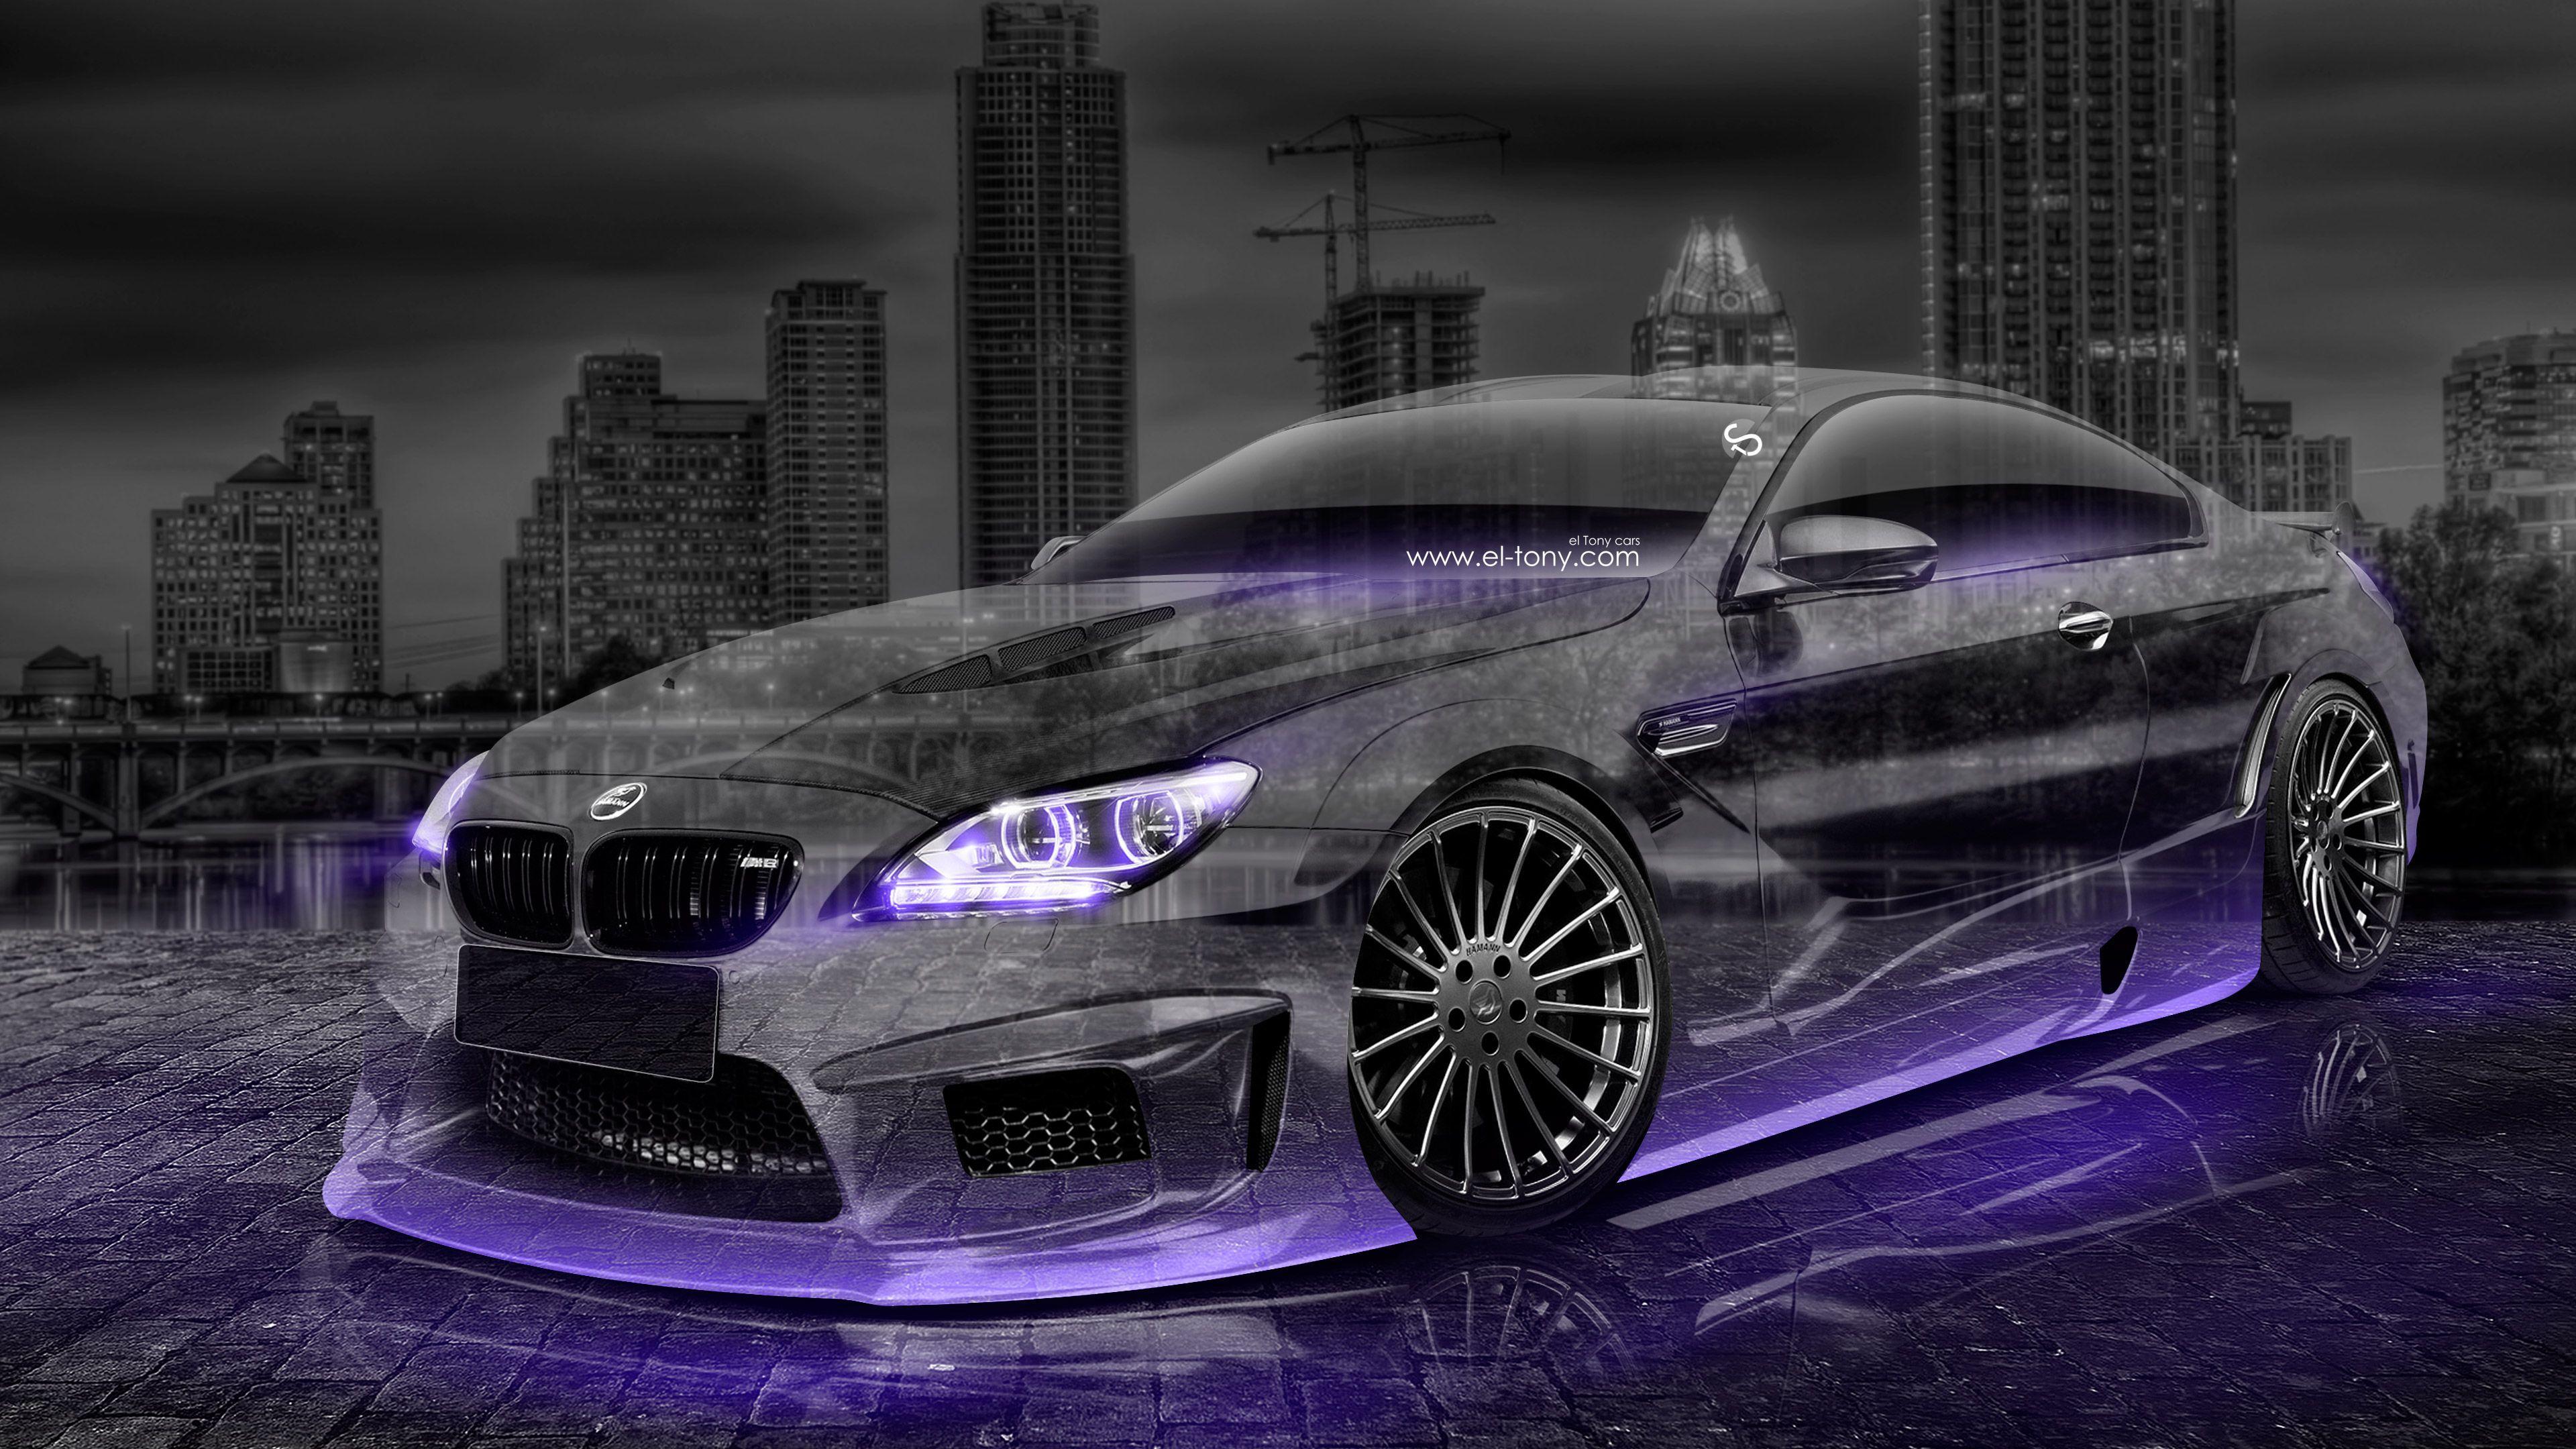 BMW M6 Hamann Tuning 3D Crystal City Car